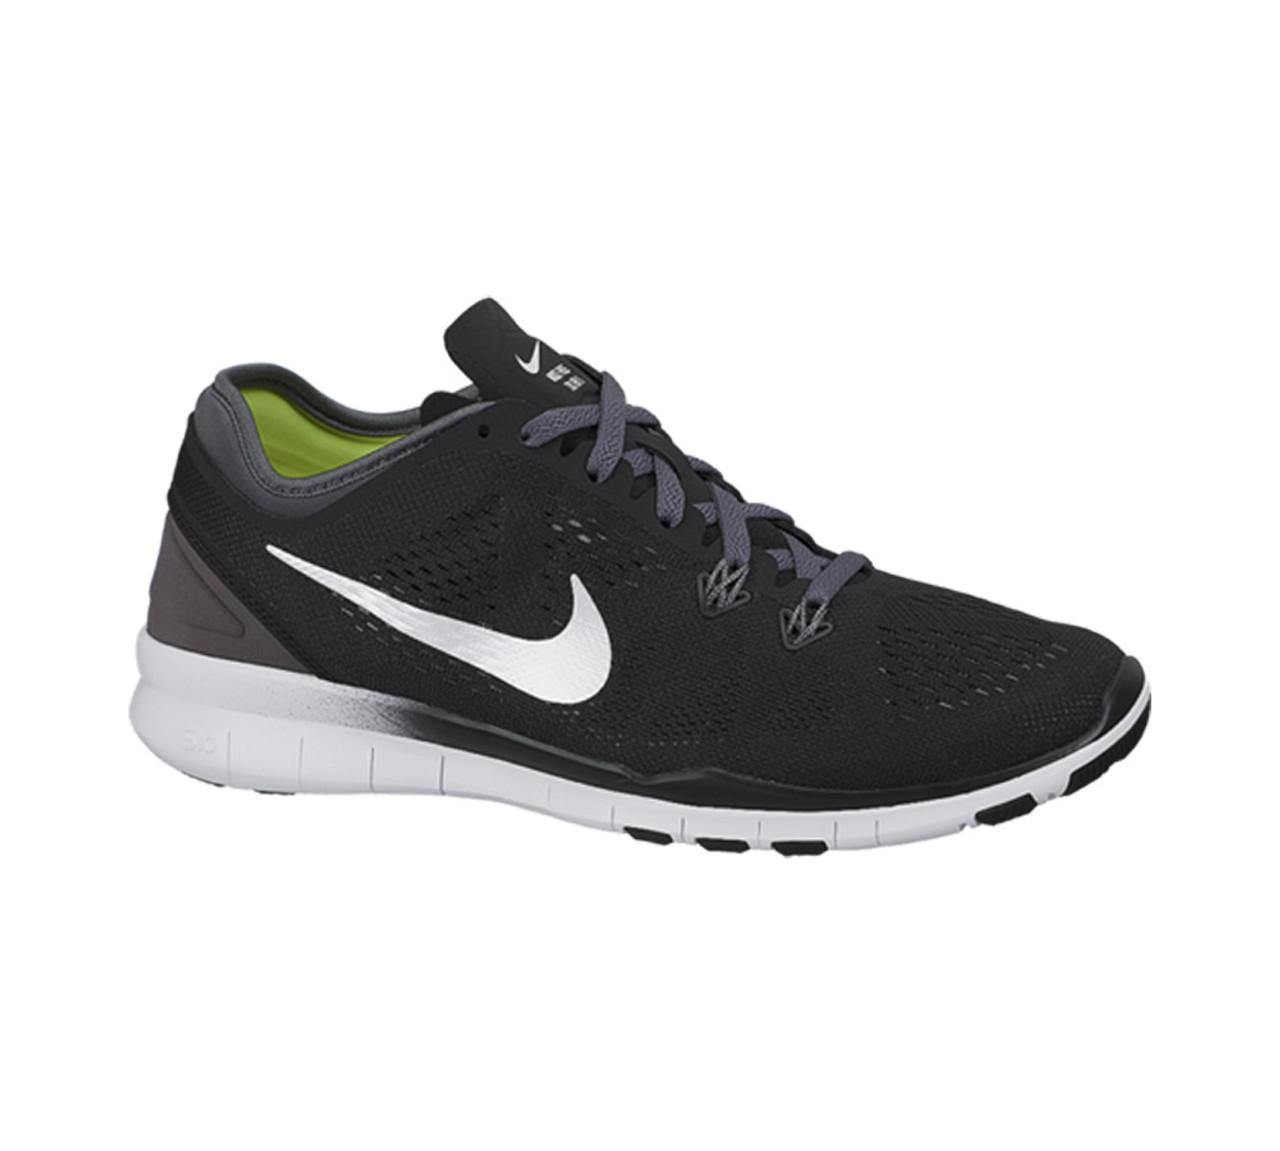 premium selection aa30c babf5 Nike Women's Free 5.0 TR Fit 5 Cross Trainer Black/Dark Grey